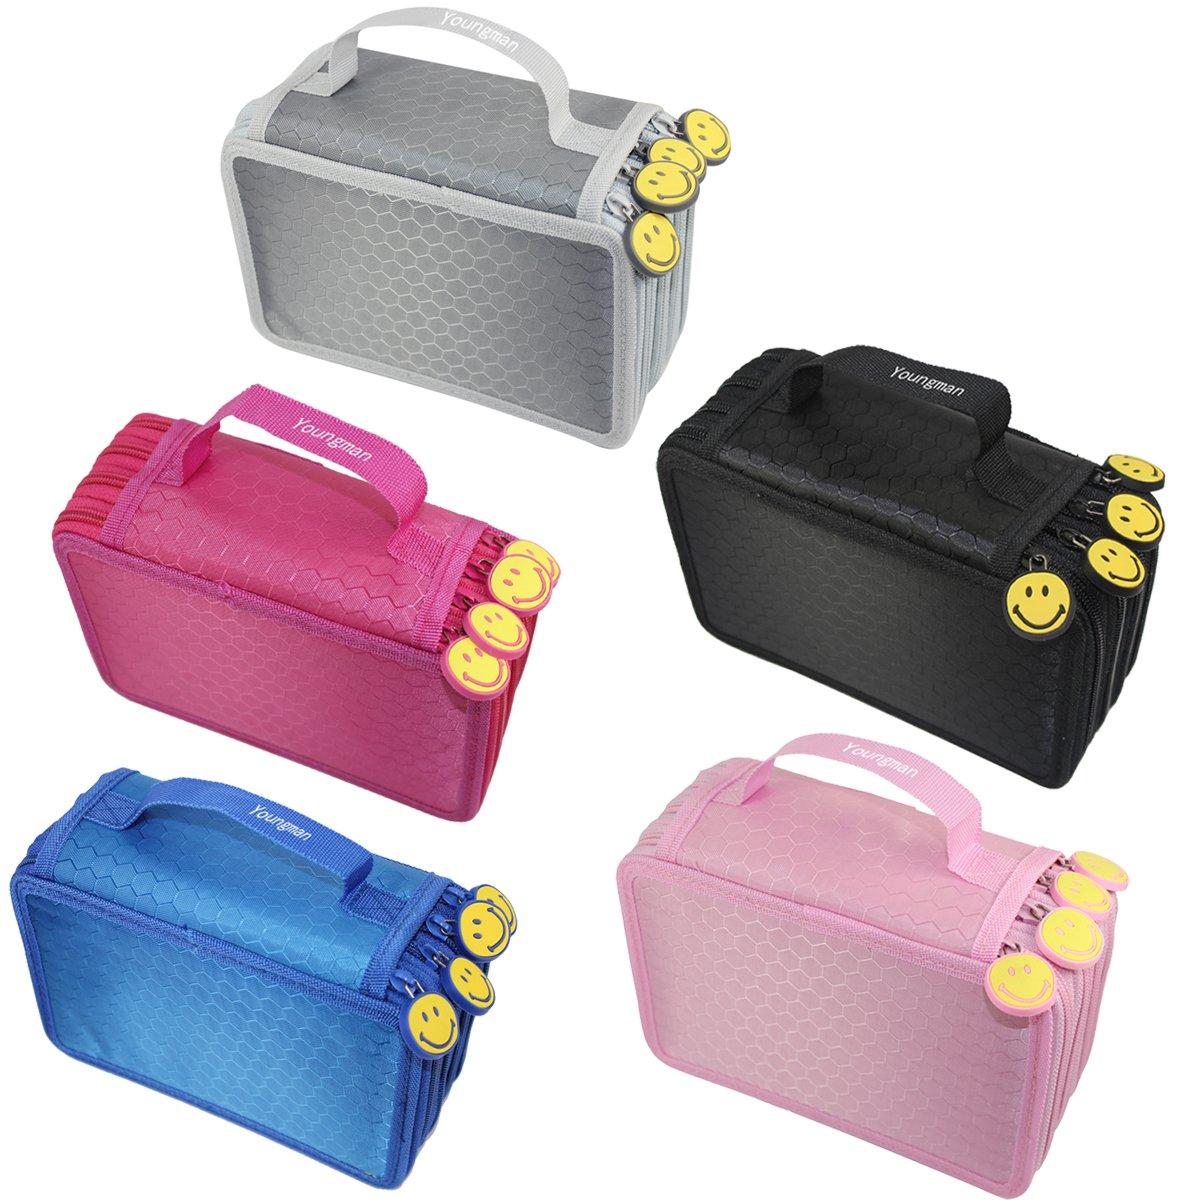 Yougman 72 Piece Colors Super Large Capacity Multi-layer Students Pencil Case Pen Bag Cosmetic Case Bag